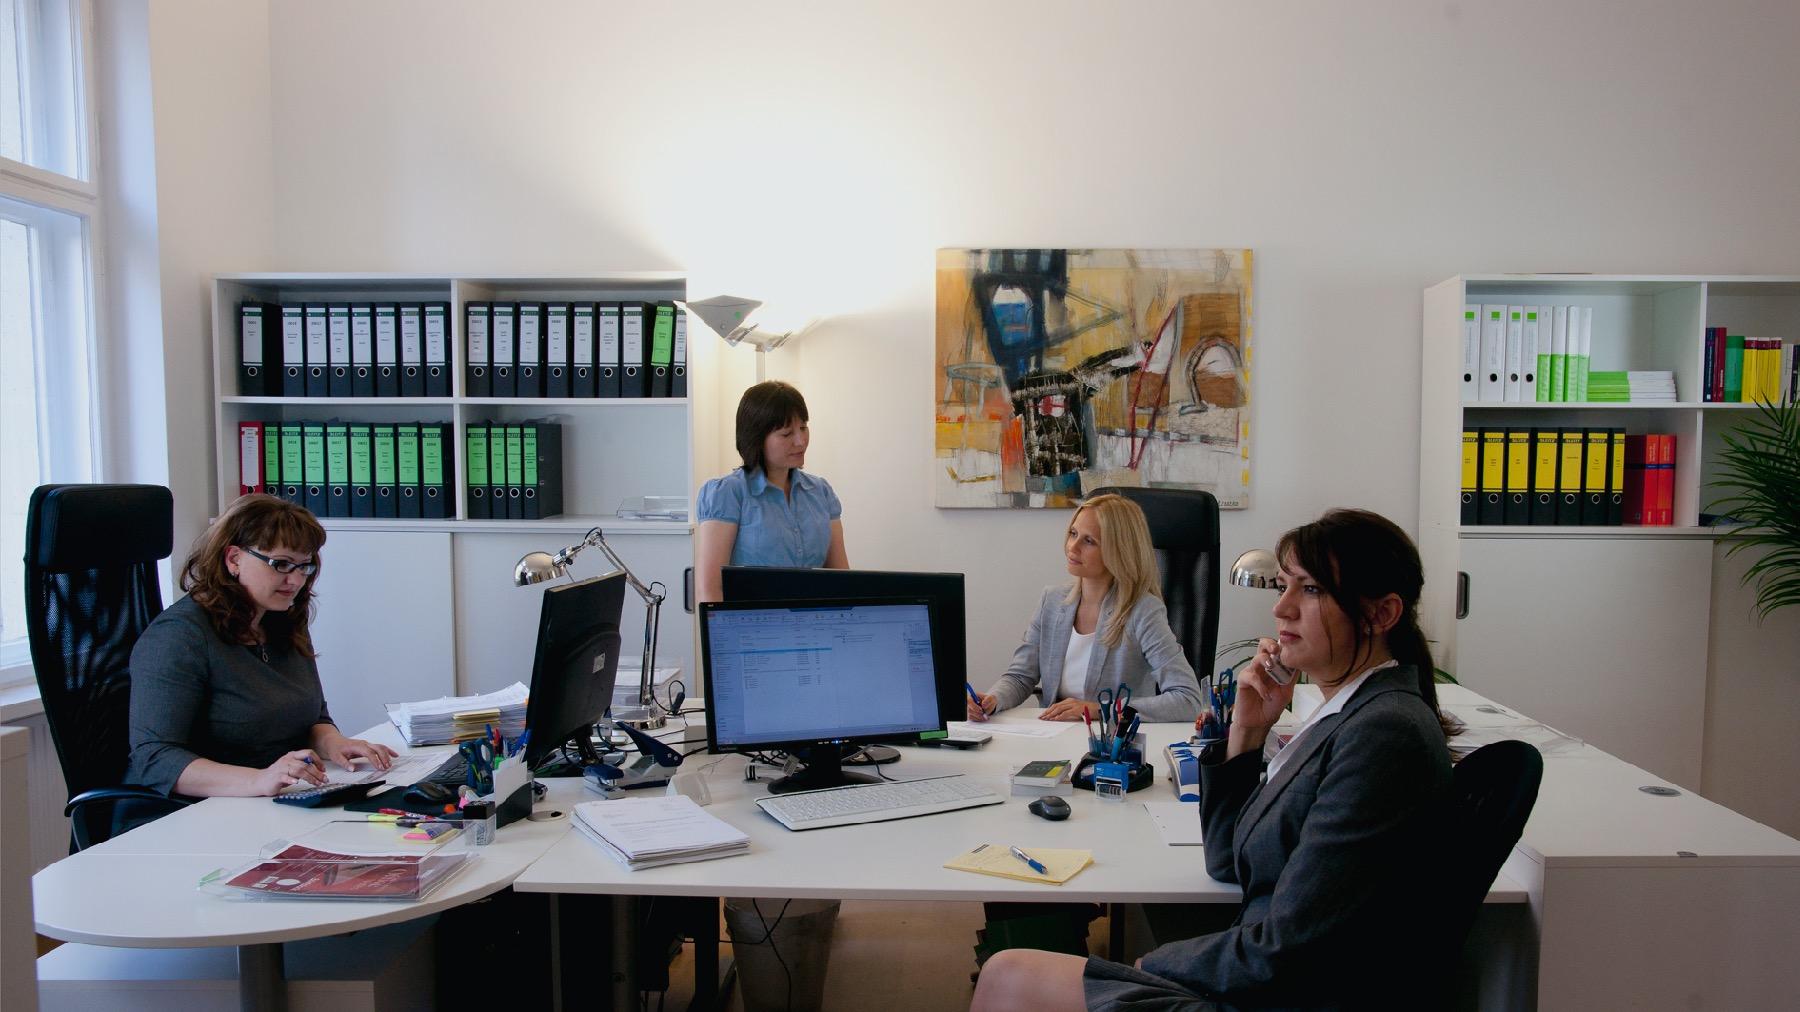 Steuerberatung-Irina-Karow-1